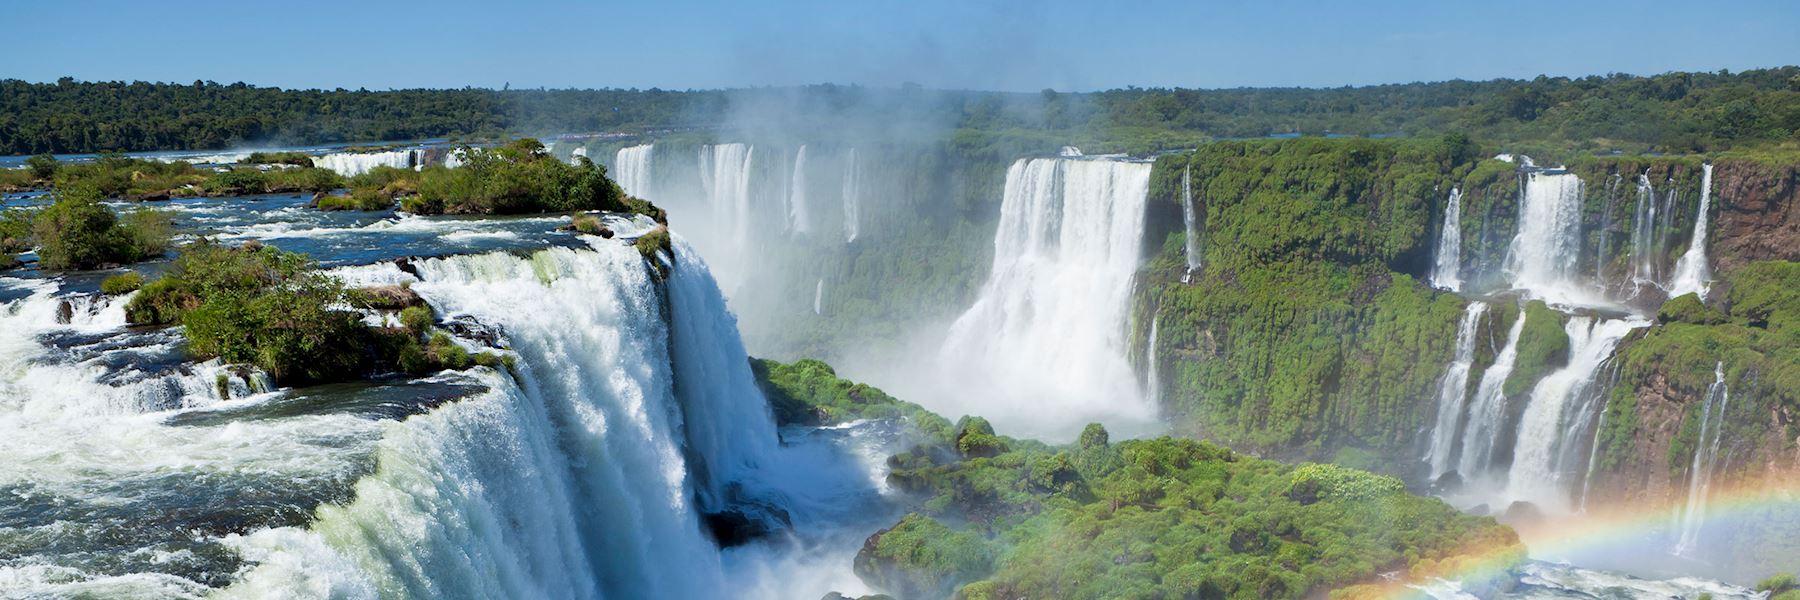 Argentina trip ideas